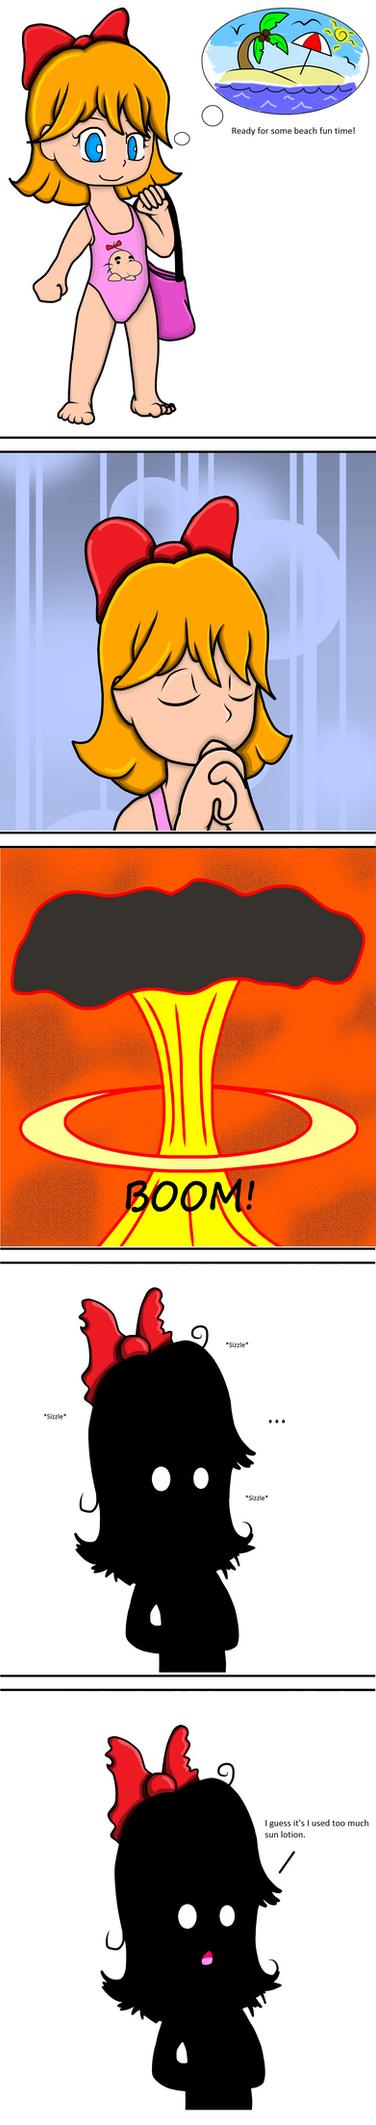 Teleport BOOM by AngryOldBat